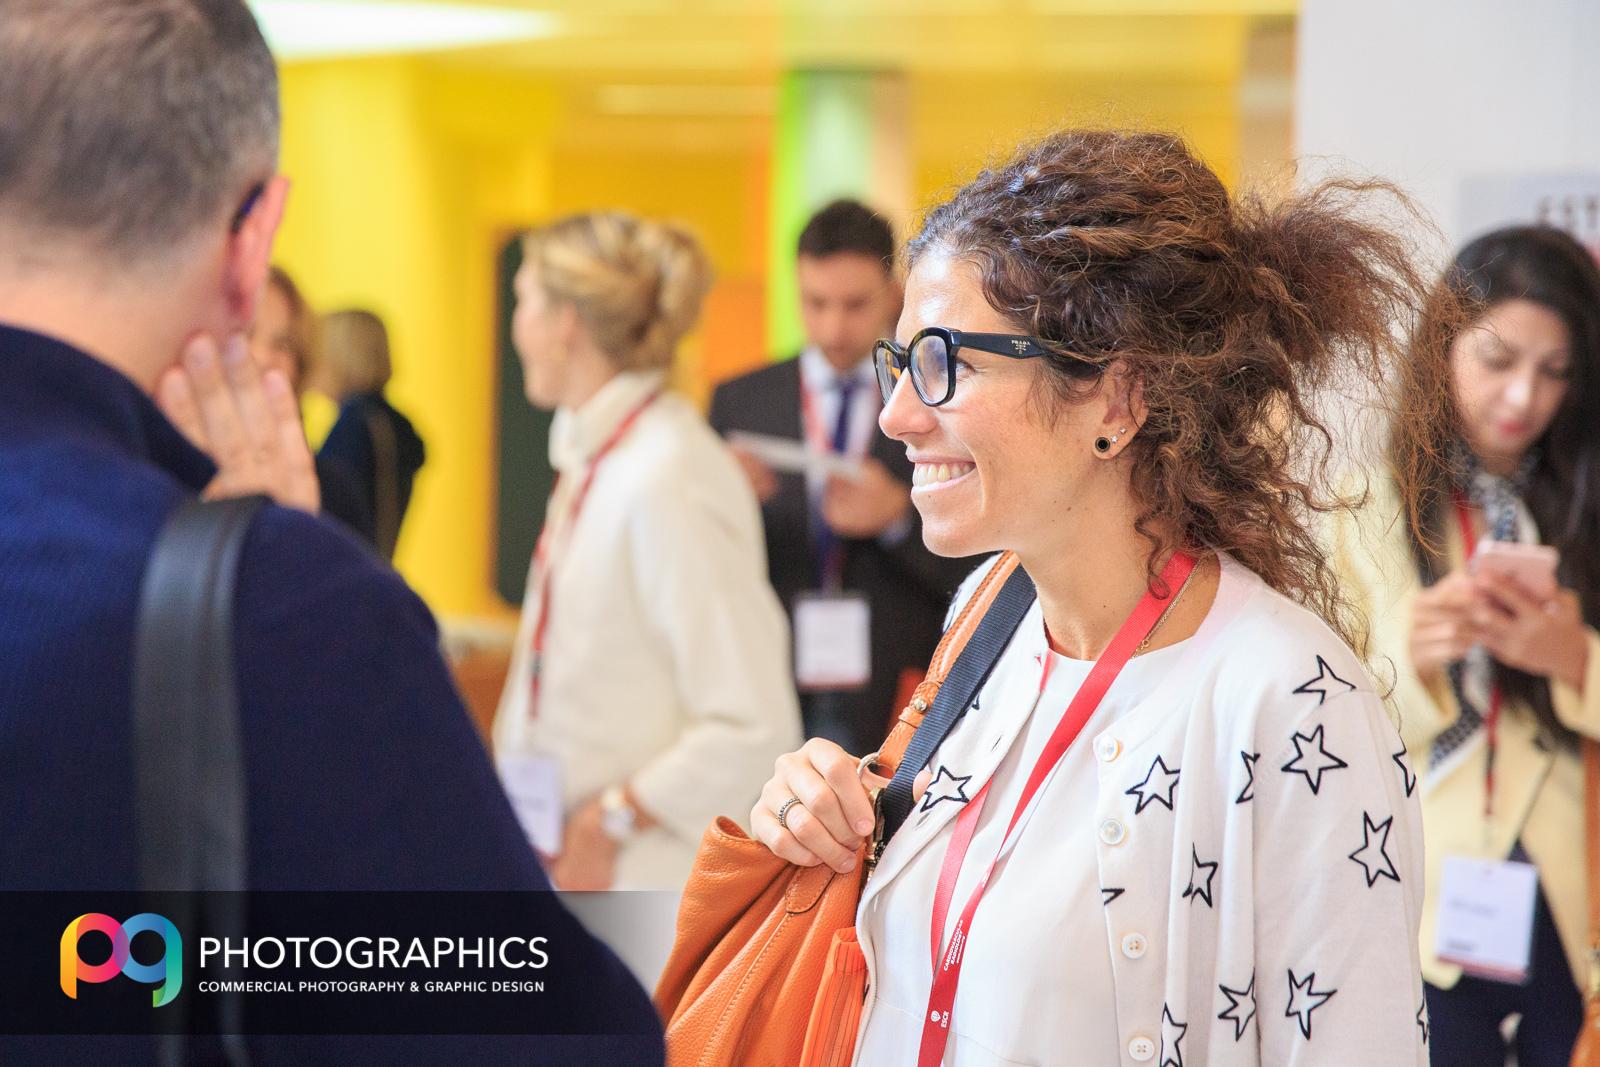 ESCR-2018-conference-event-photography-UK-glasgow-edinburgh-14.jpg